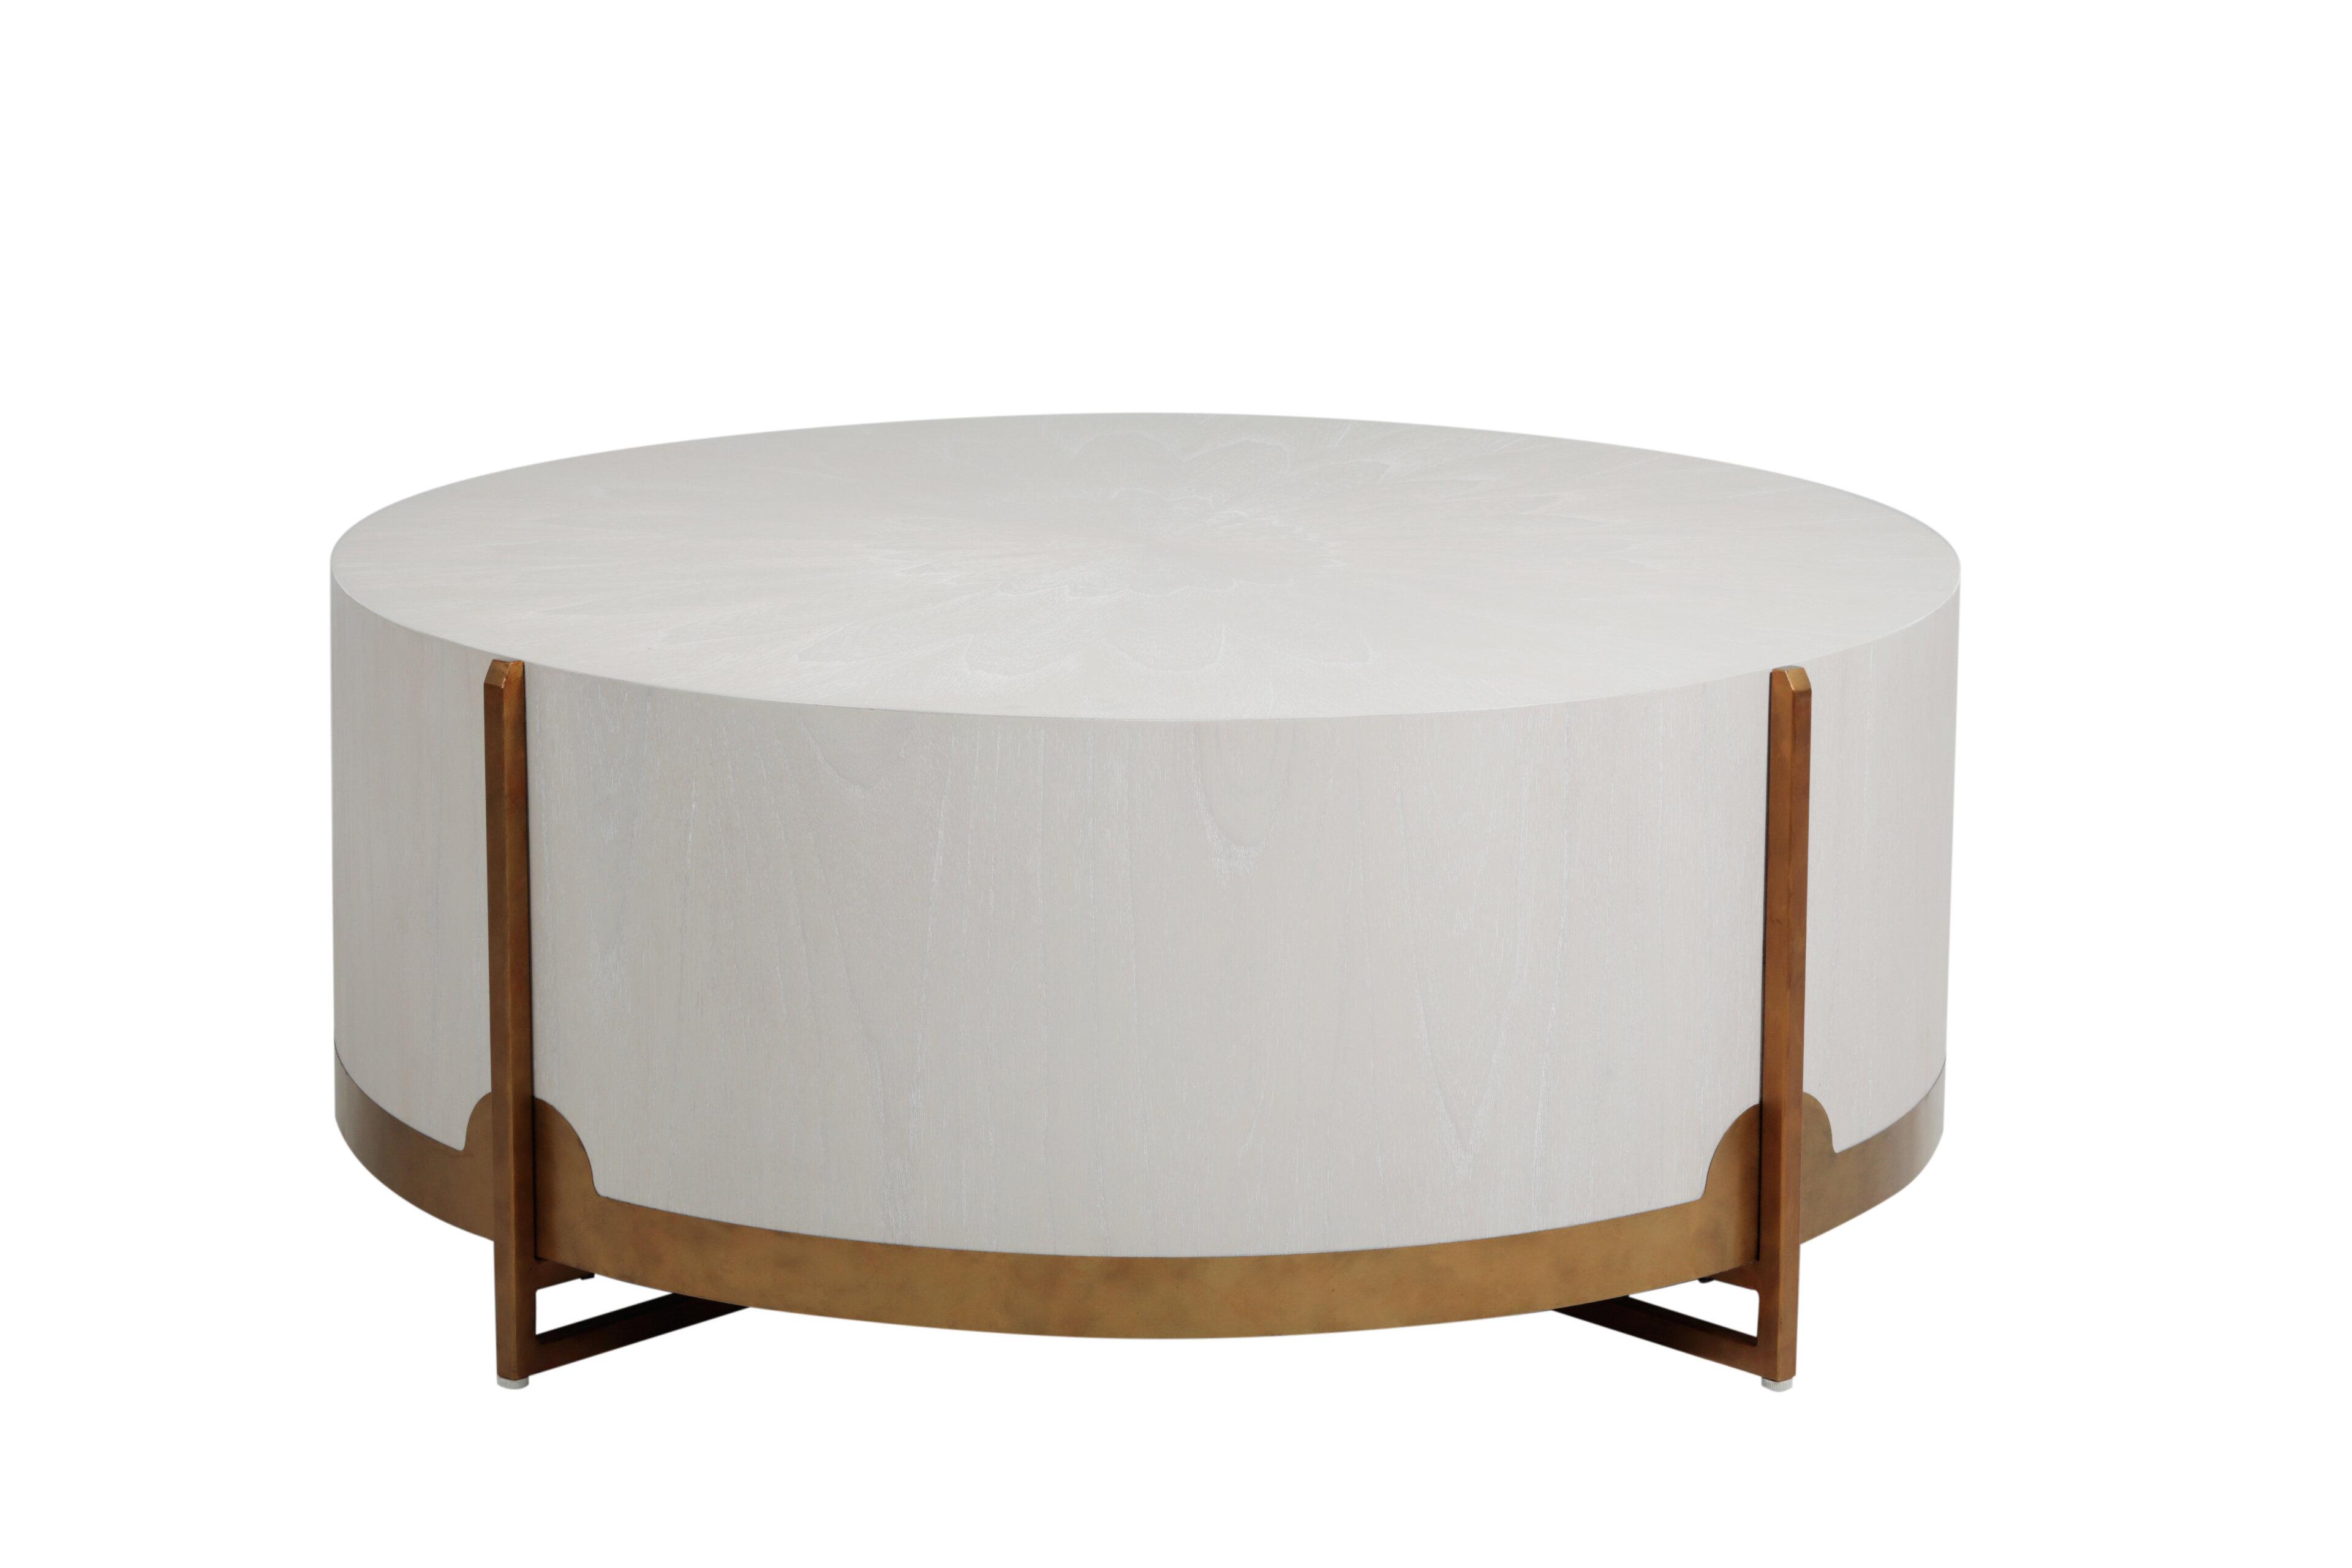 gabby clifton coffee table hacu1237 cjevent=b09e180f310f11ea a20a &refID=CJ CJ &PID=CJ &clickid=b09e180f310f11ea a20a